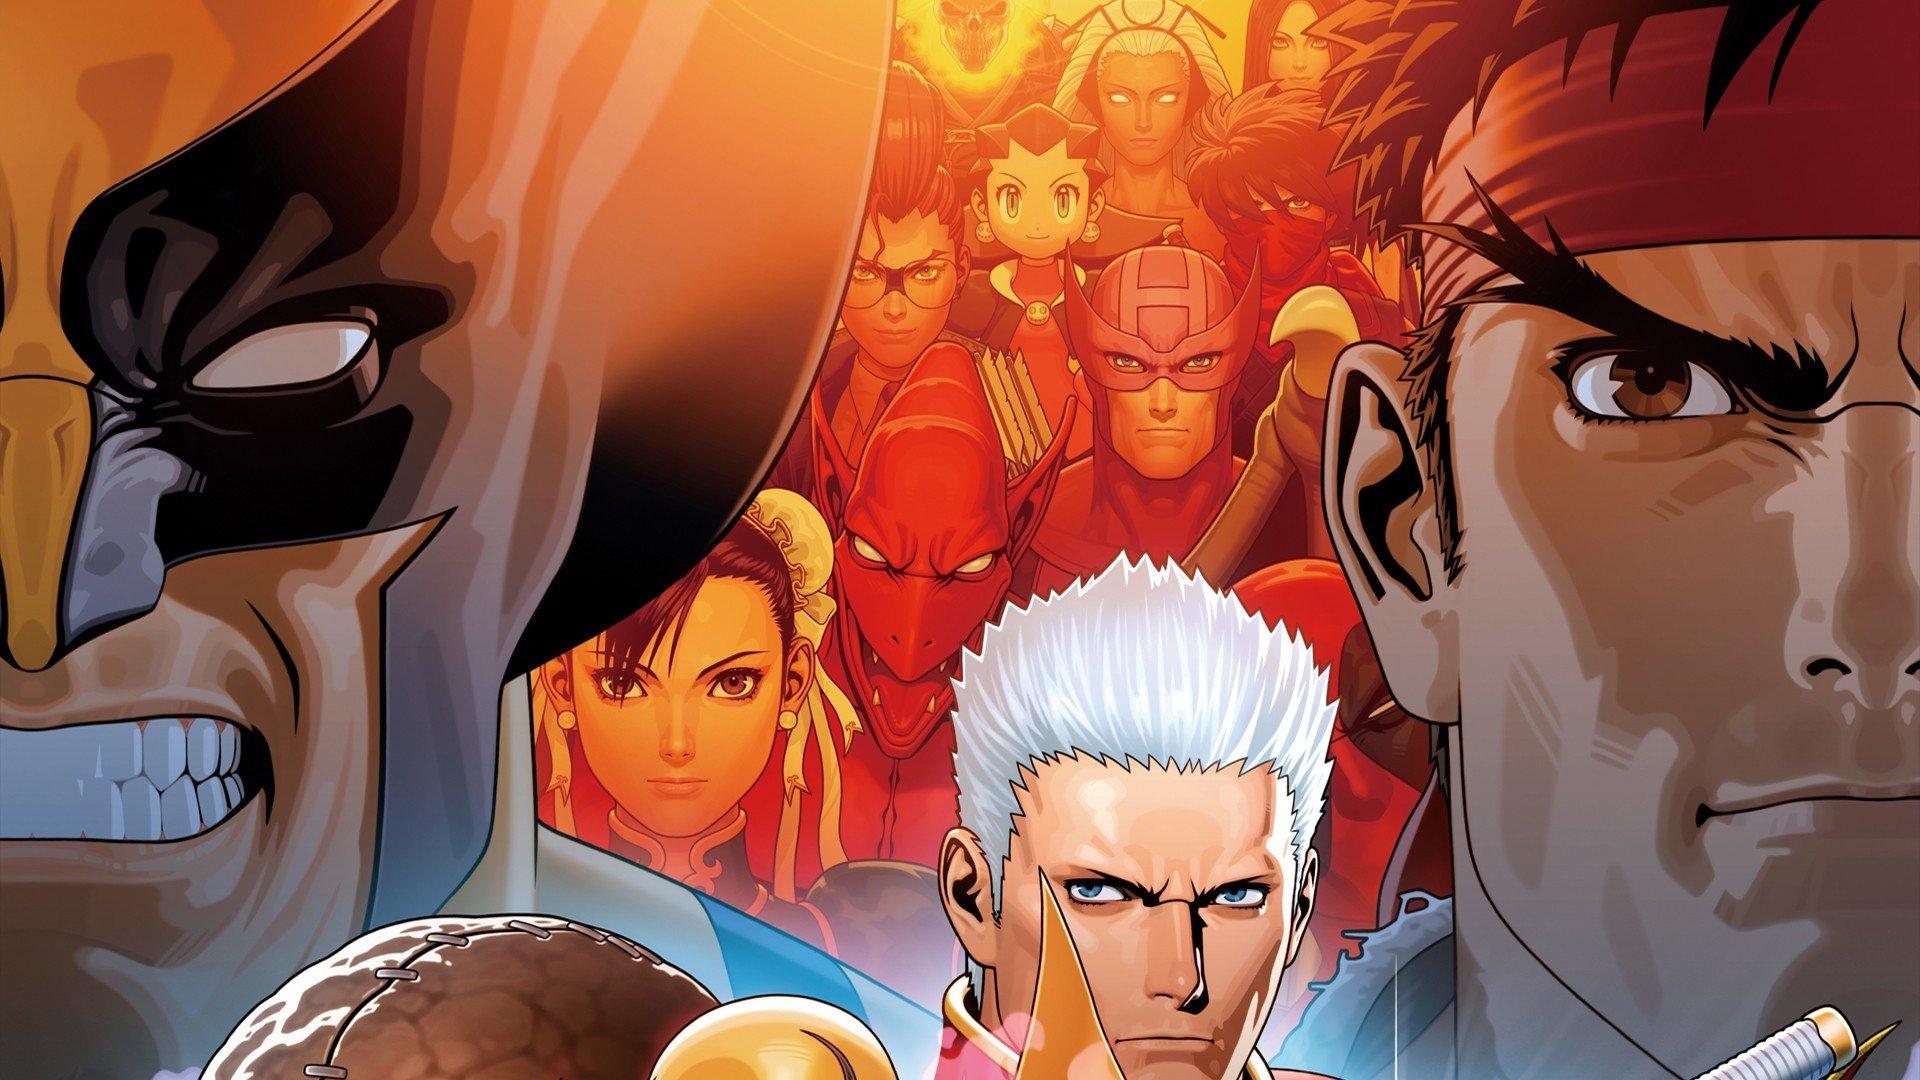 High Resolution Ultimate Marvel Vs Capcom 3 Full Hd 1080p Wallpaper